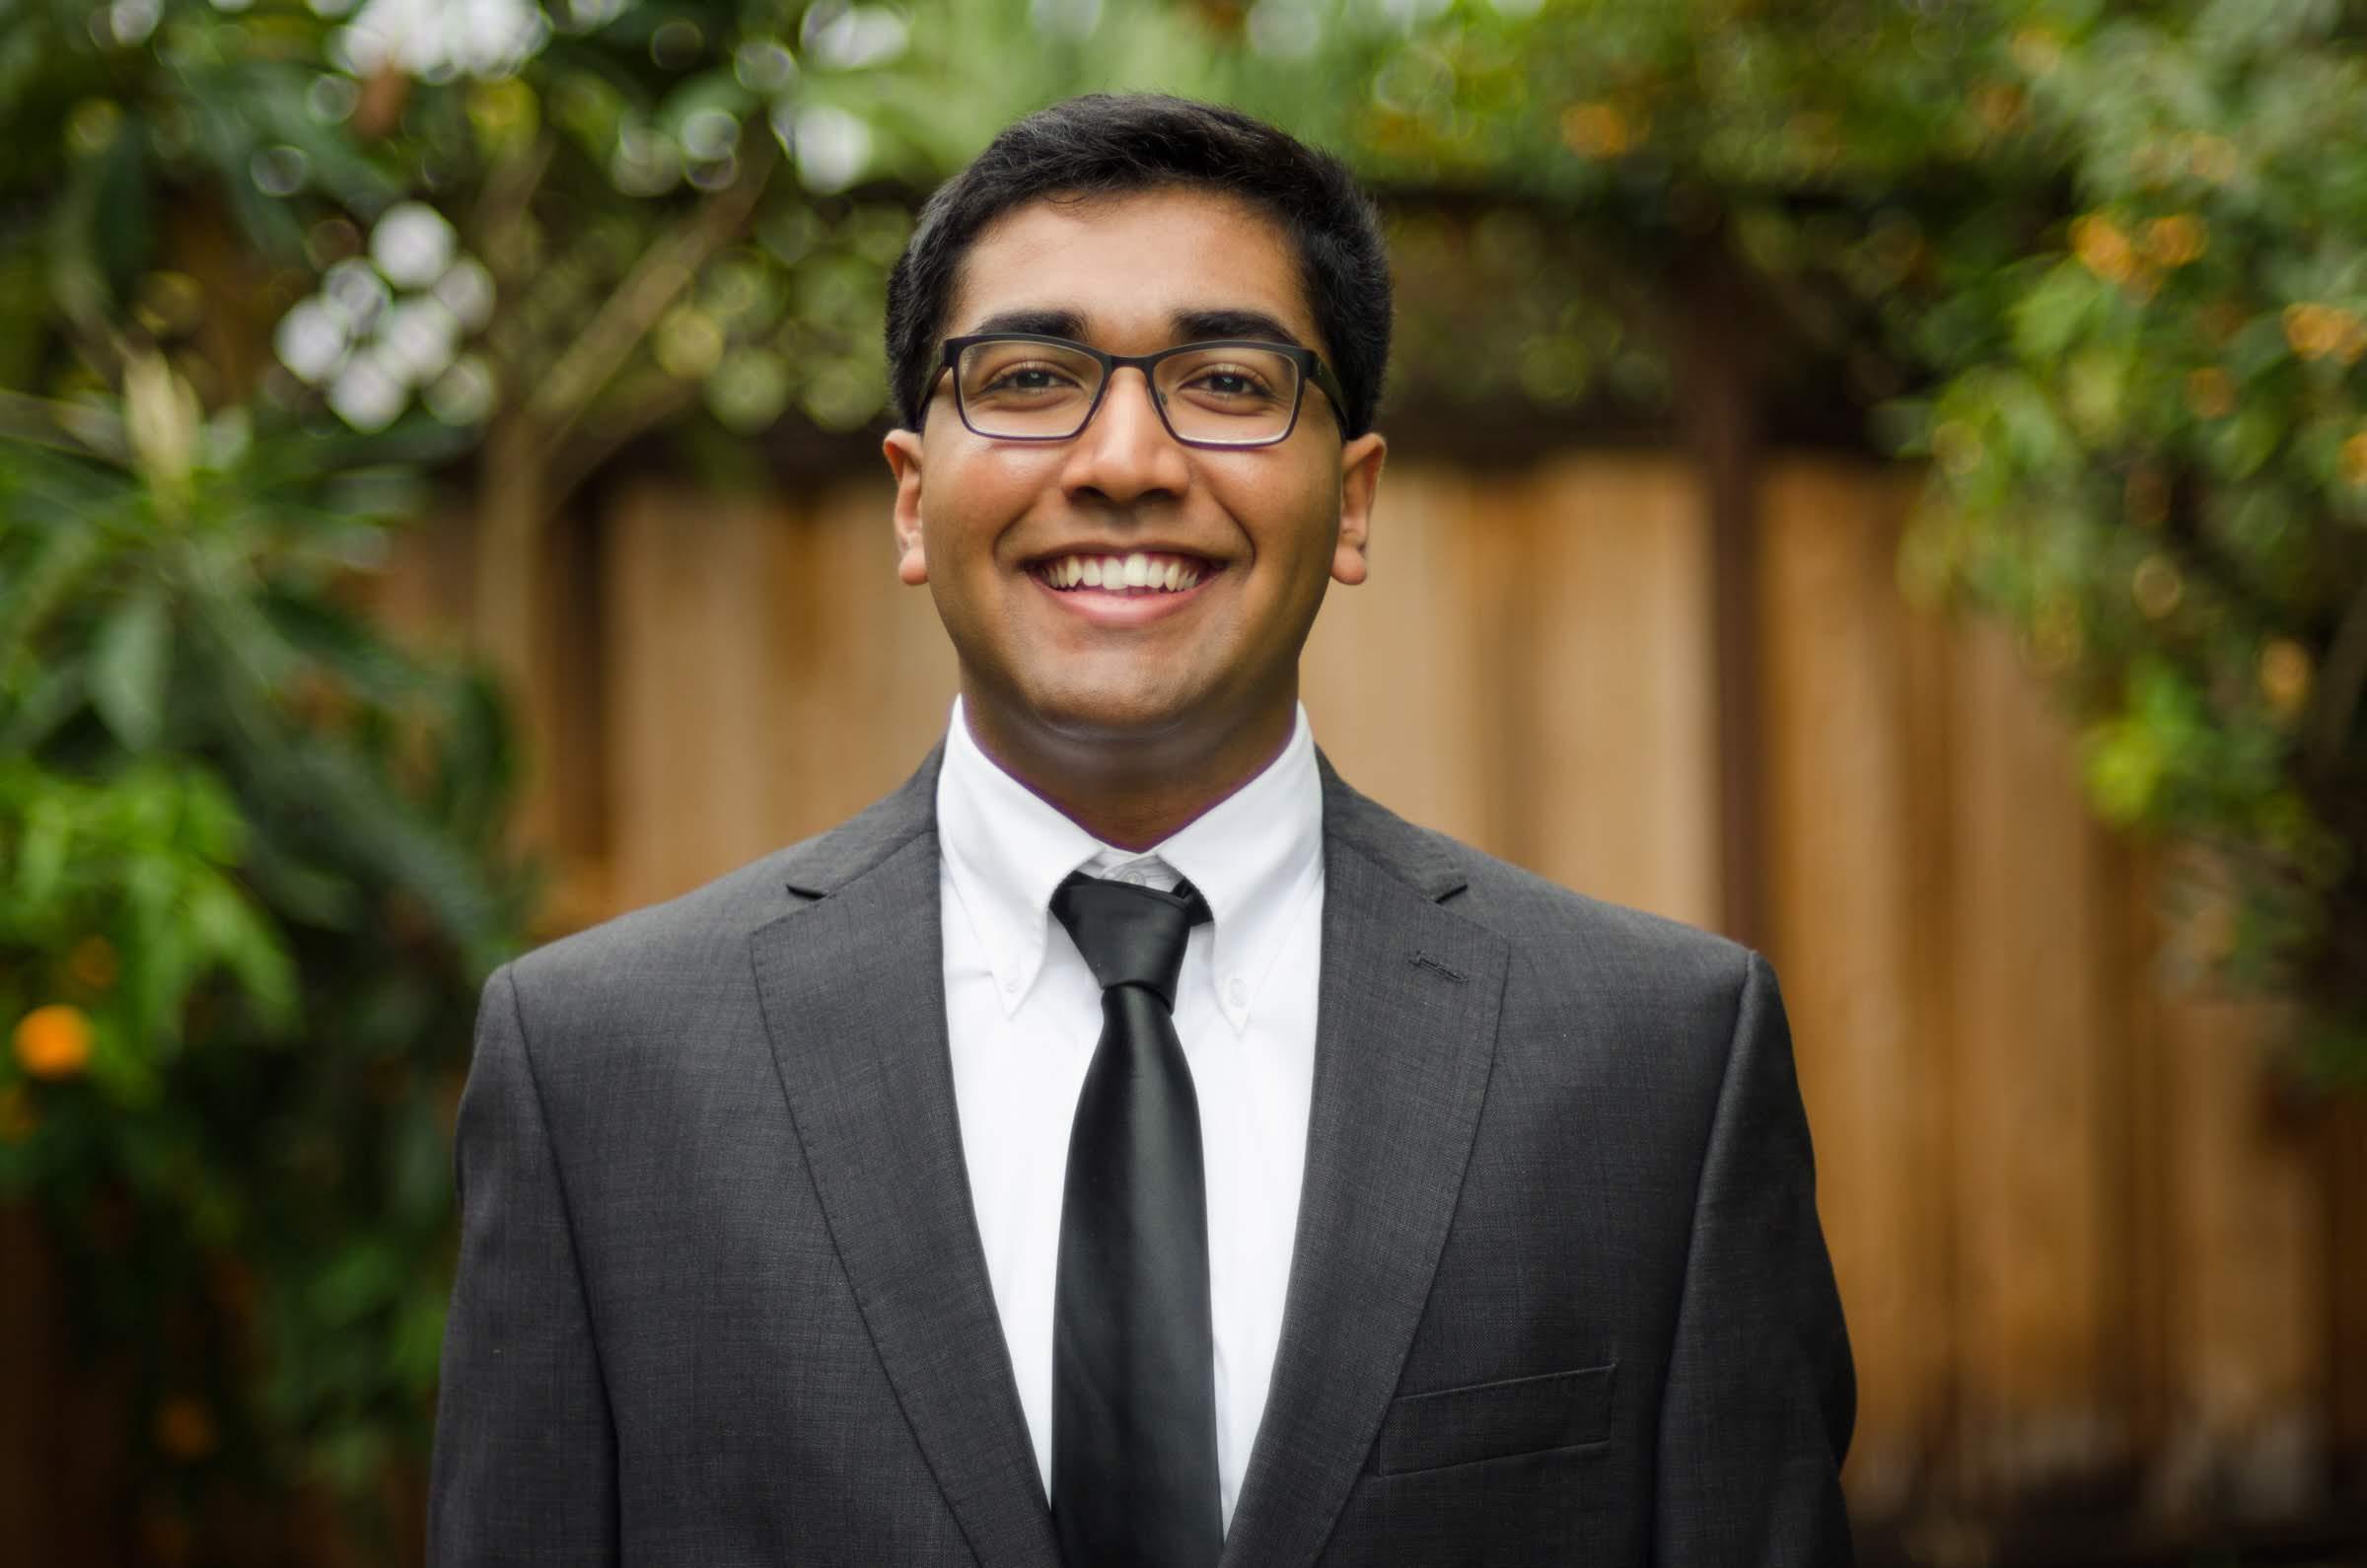 Arjun Mathur, SJSU student